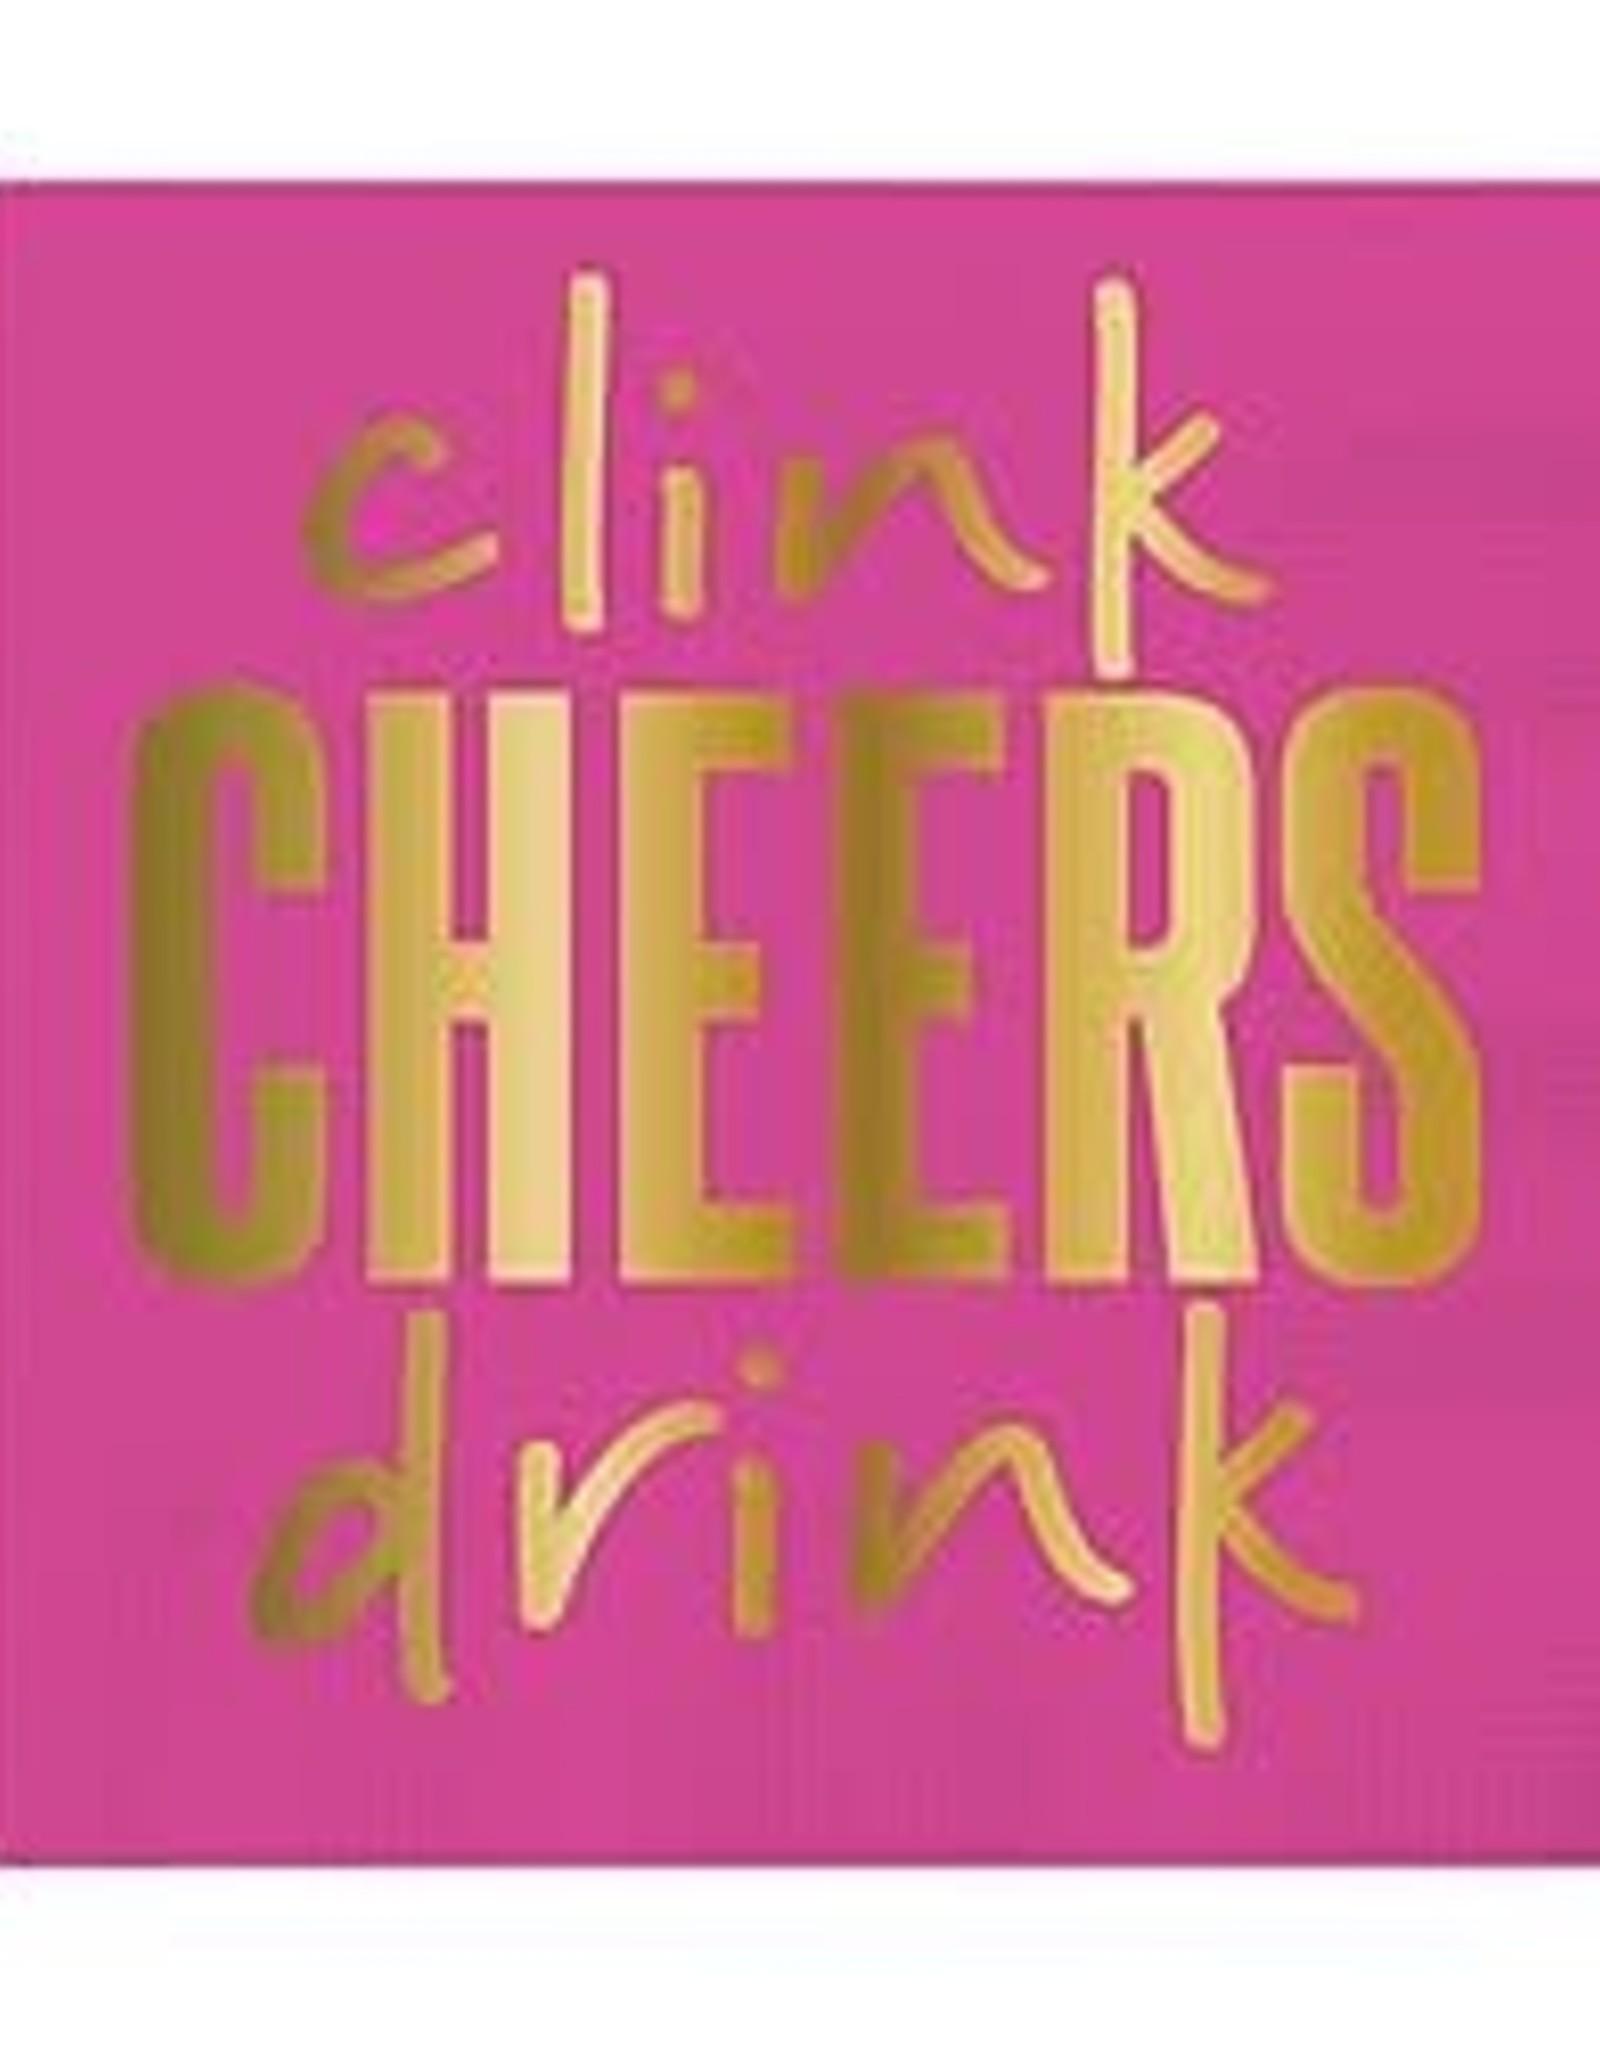 Slant Bev Napkin- Clink Cheers Drink